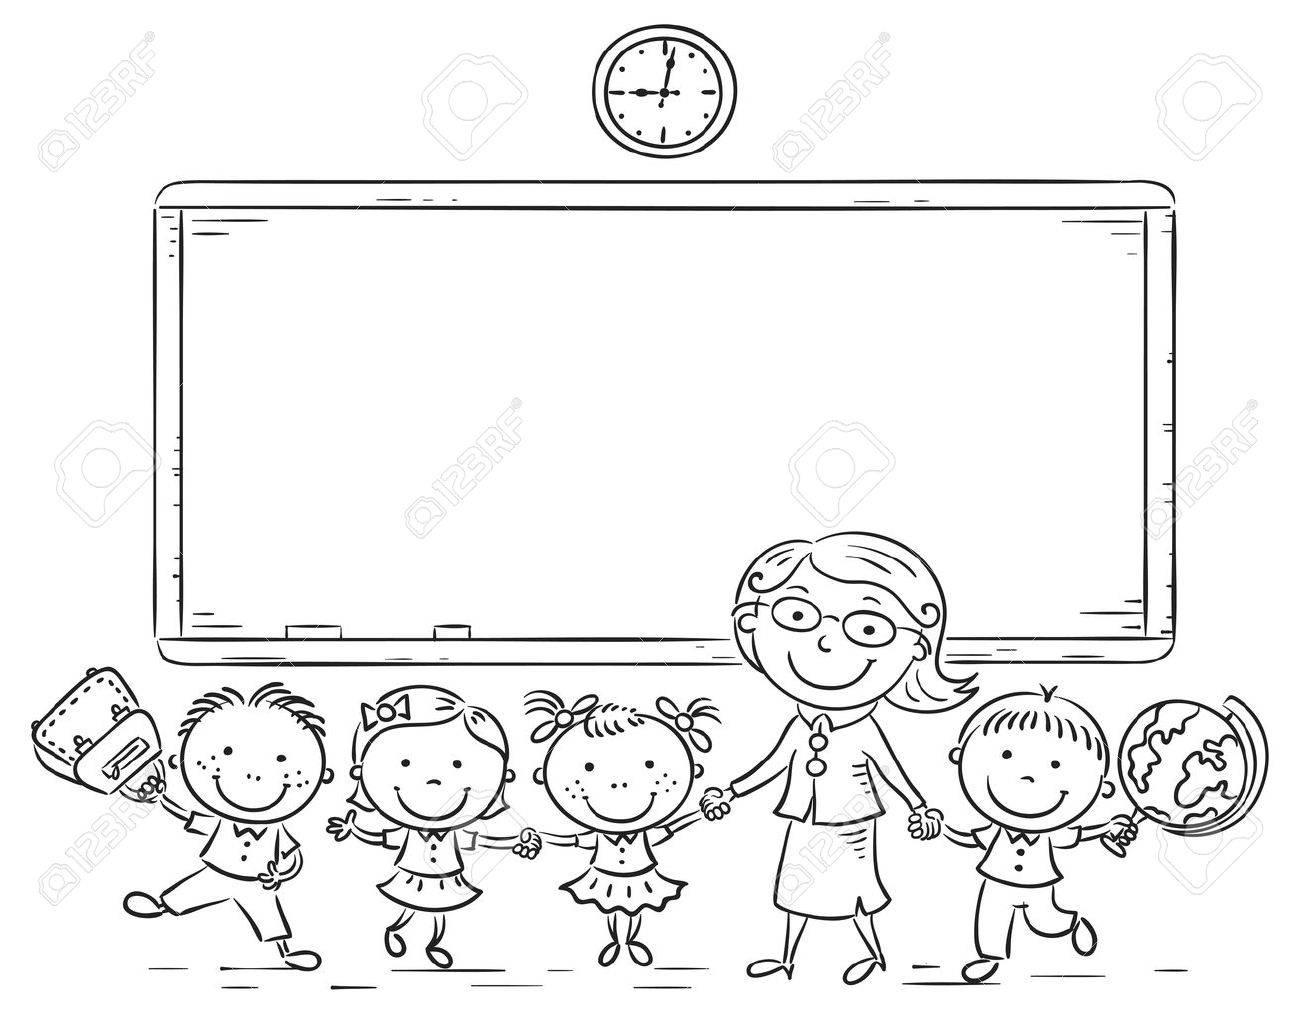 Teacher Blackboard Cliparts, Stock Vector And Royalty Free Teacher  Blackboard Illustrations